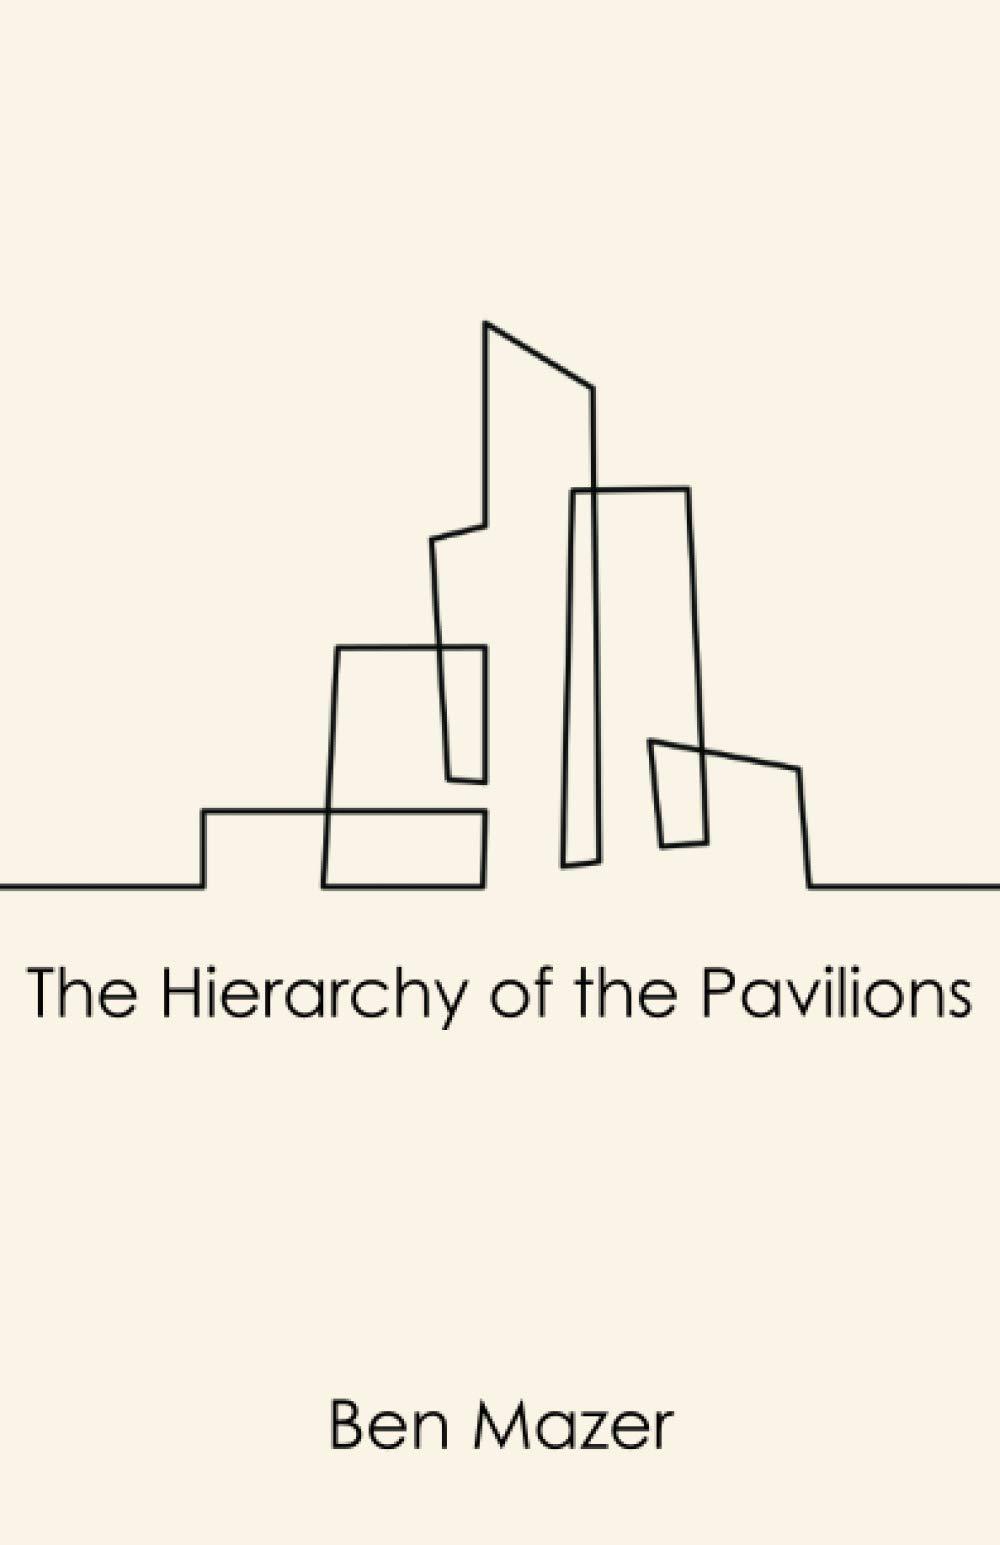 The Hierarchy of The Pavilions: Mazer, Ben: 9781952335129: Amazon.com: Books